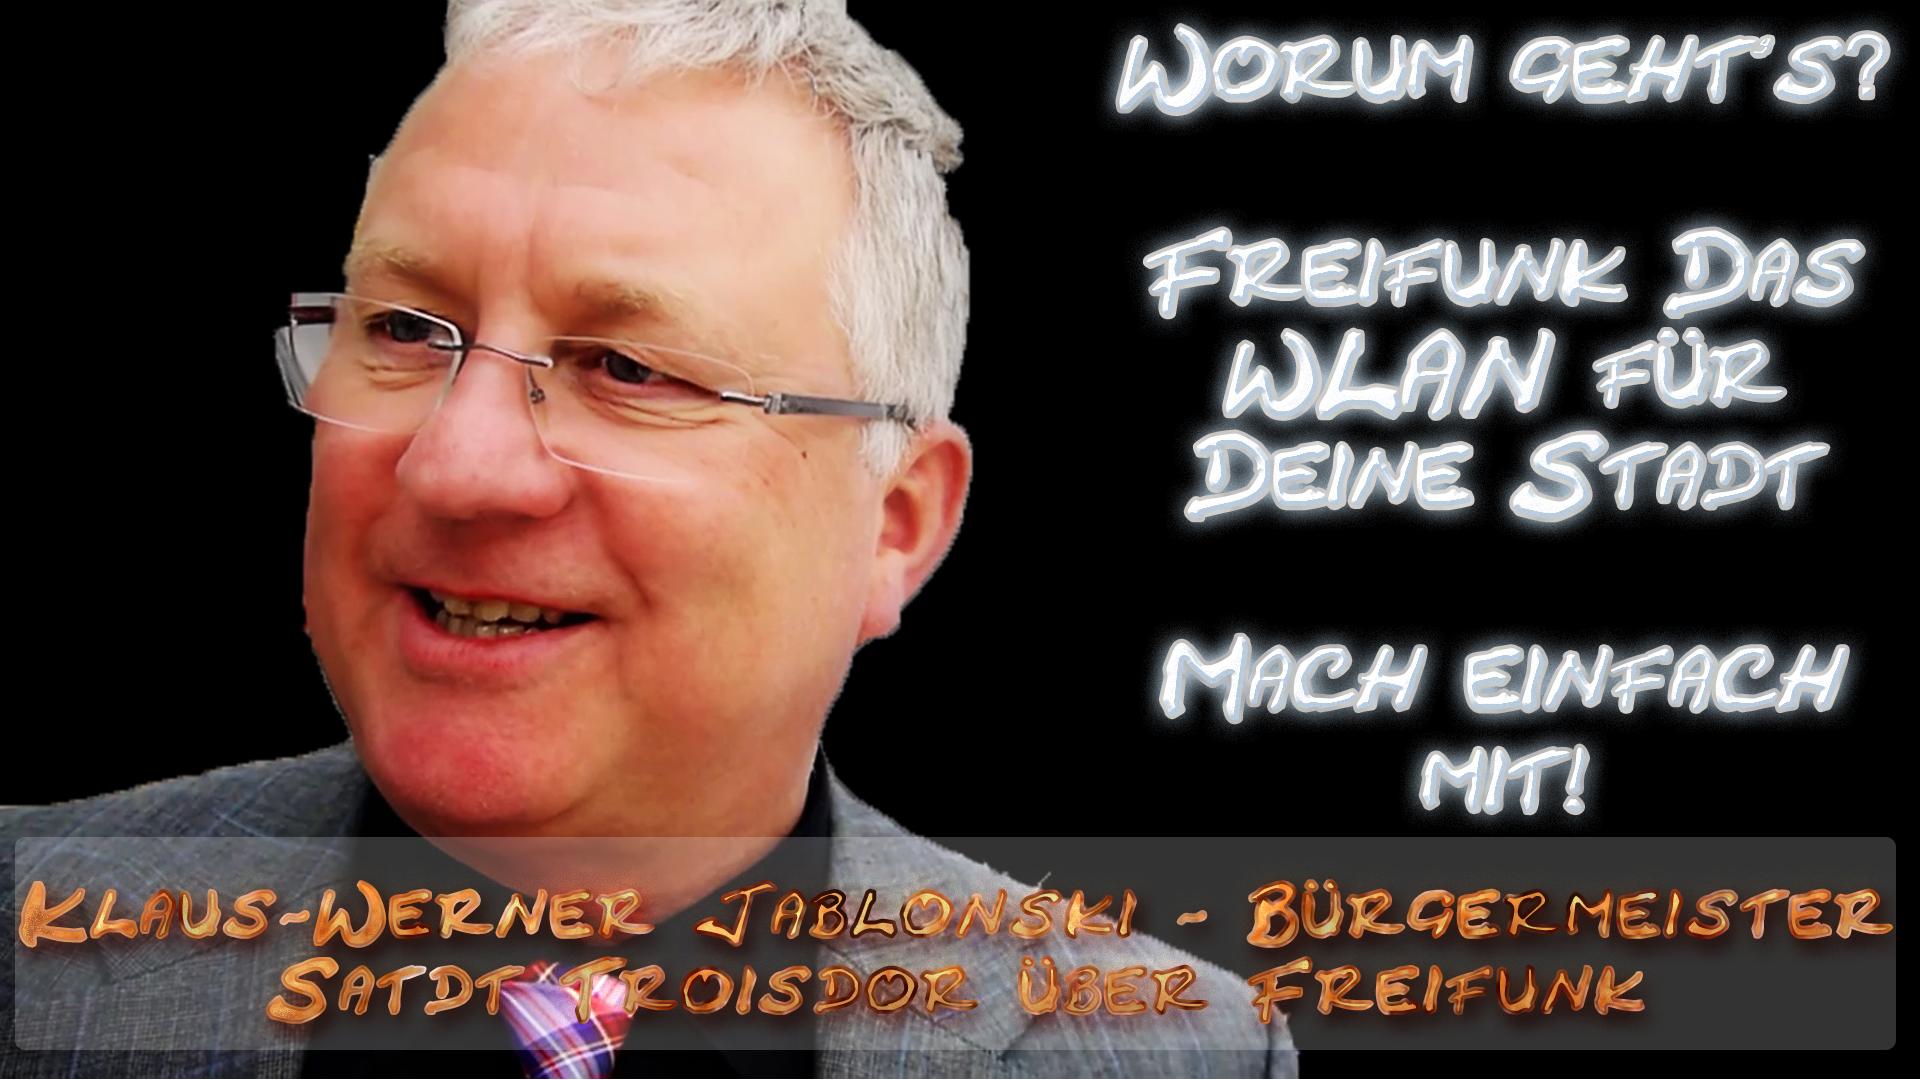 Klaus-Werner Jablonski - Bürgermeister Satdt Troisdor über Freifunk